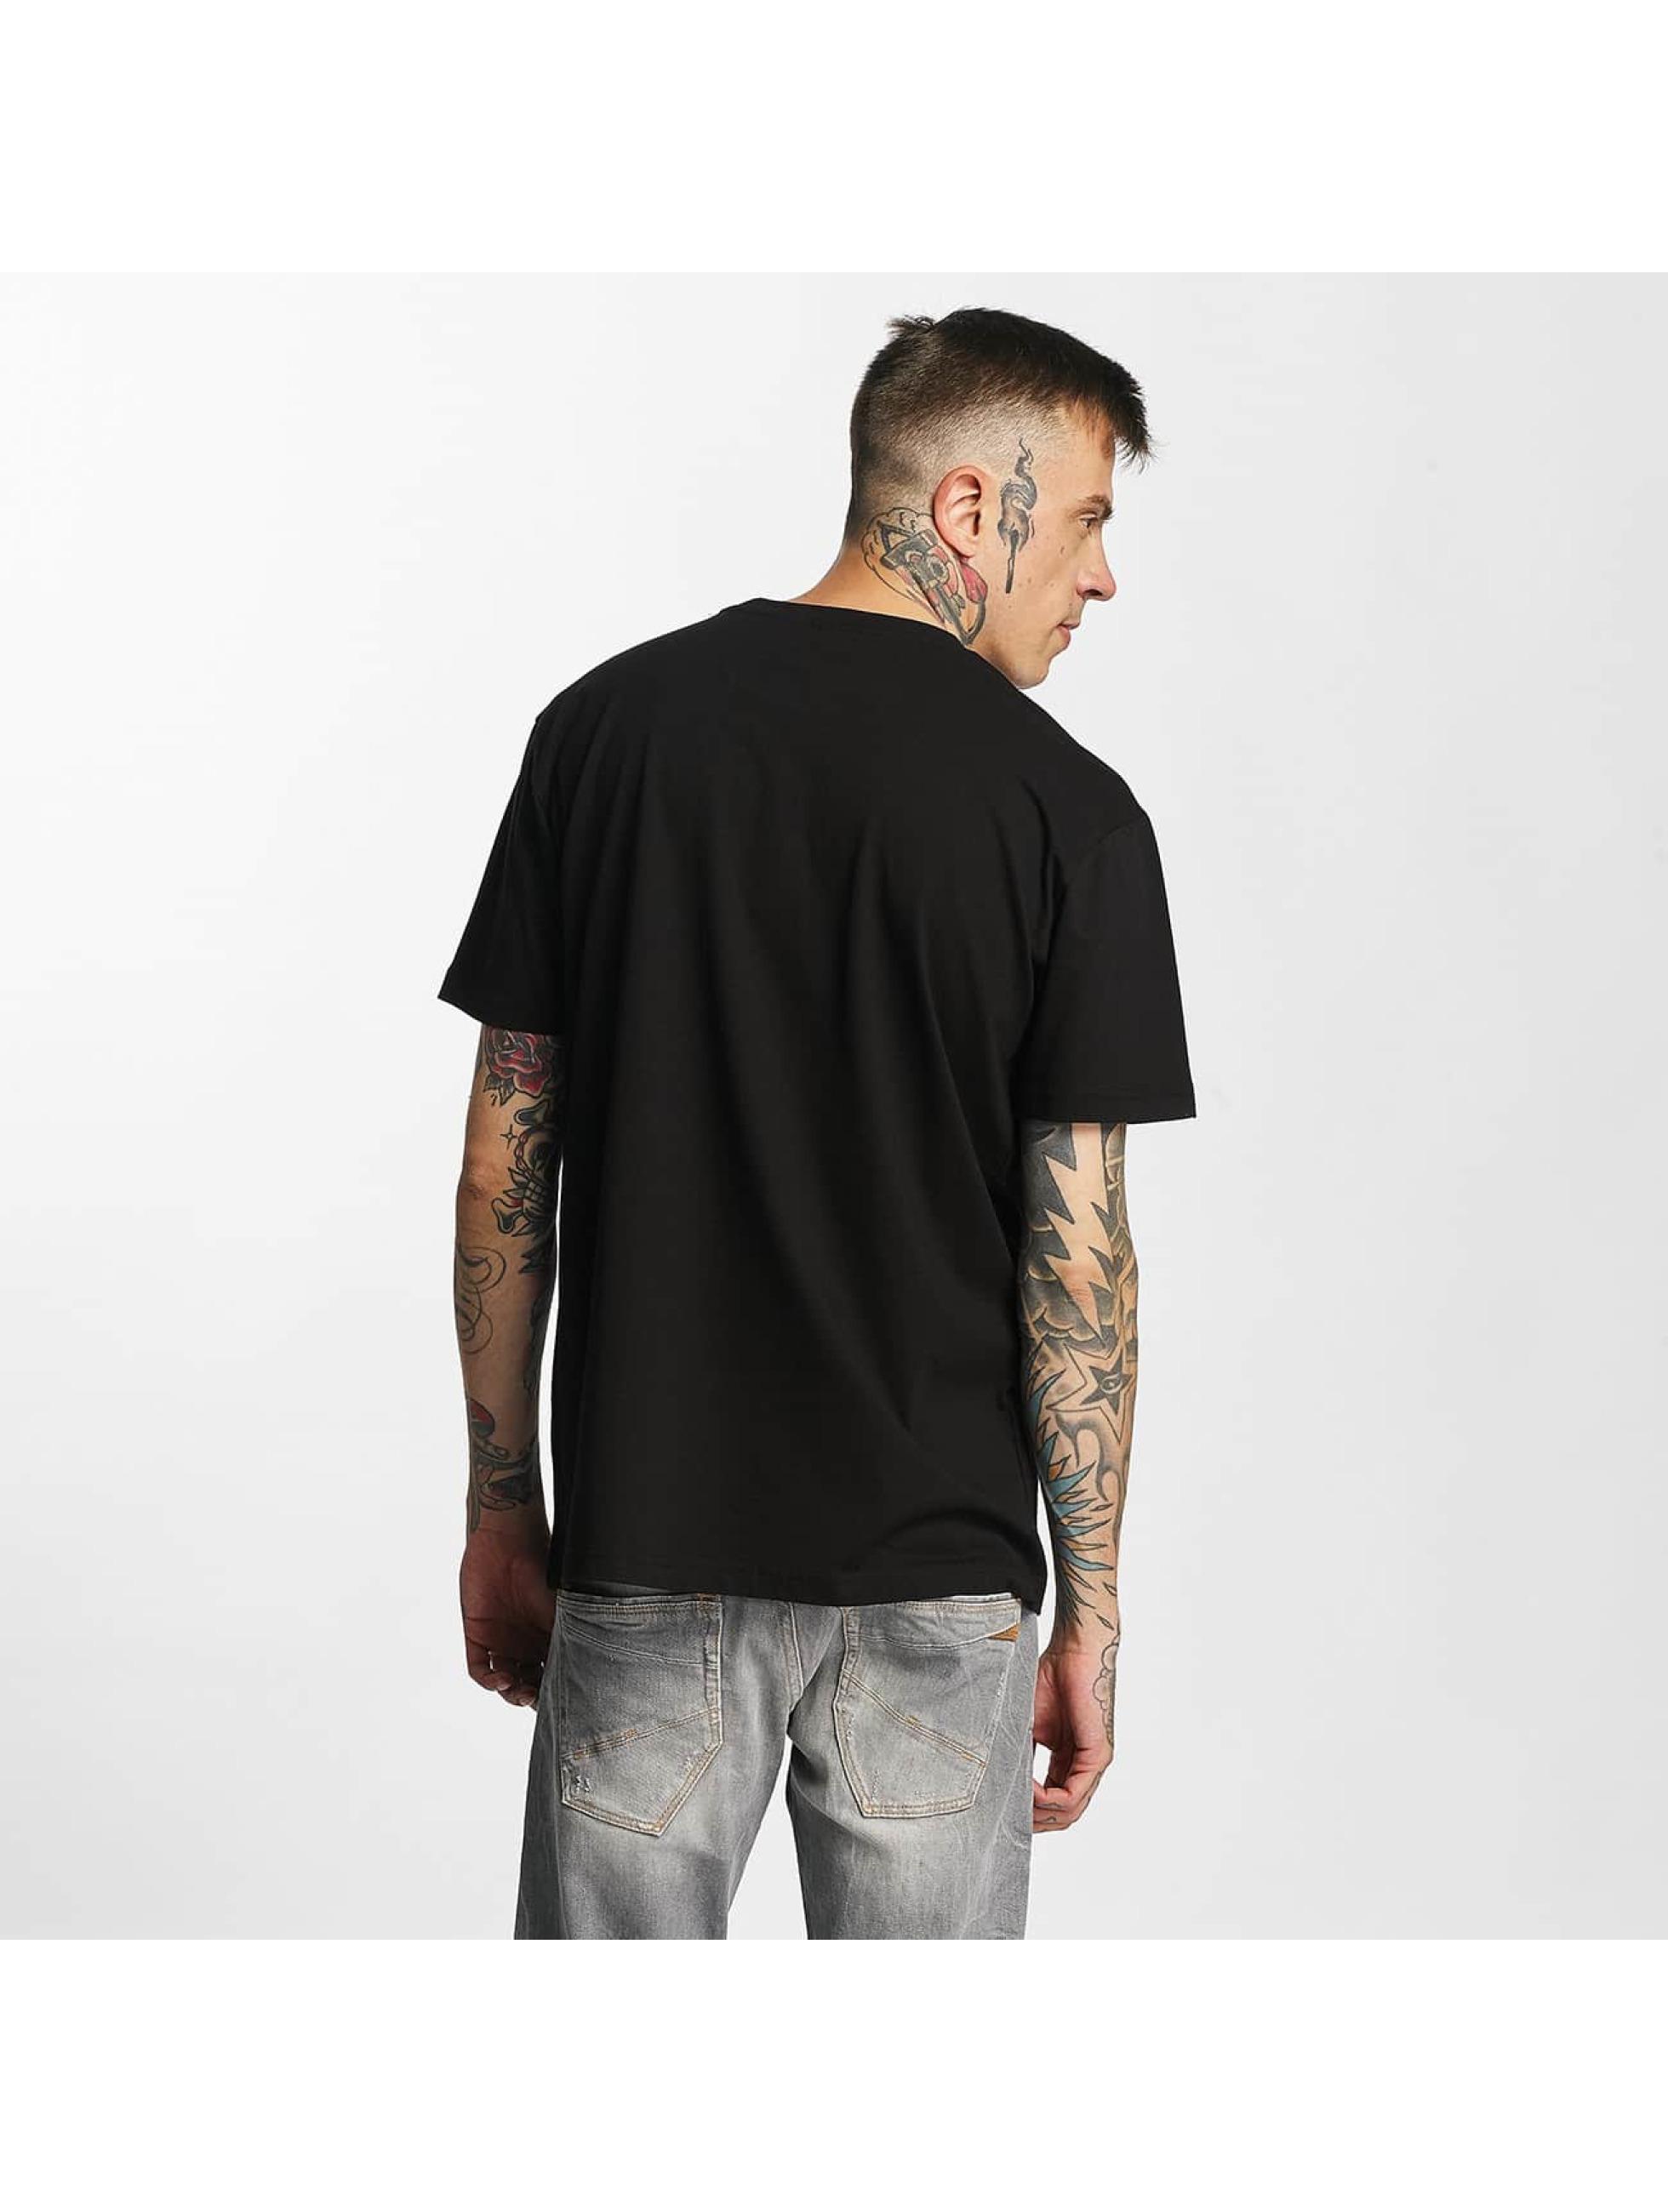 Amplified T-Shirt Biggi - Dream Crown black